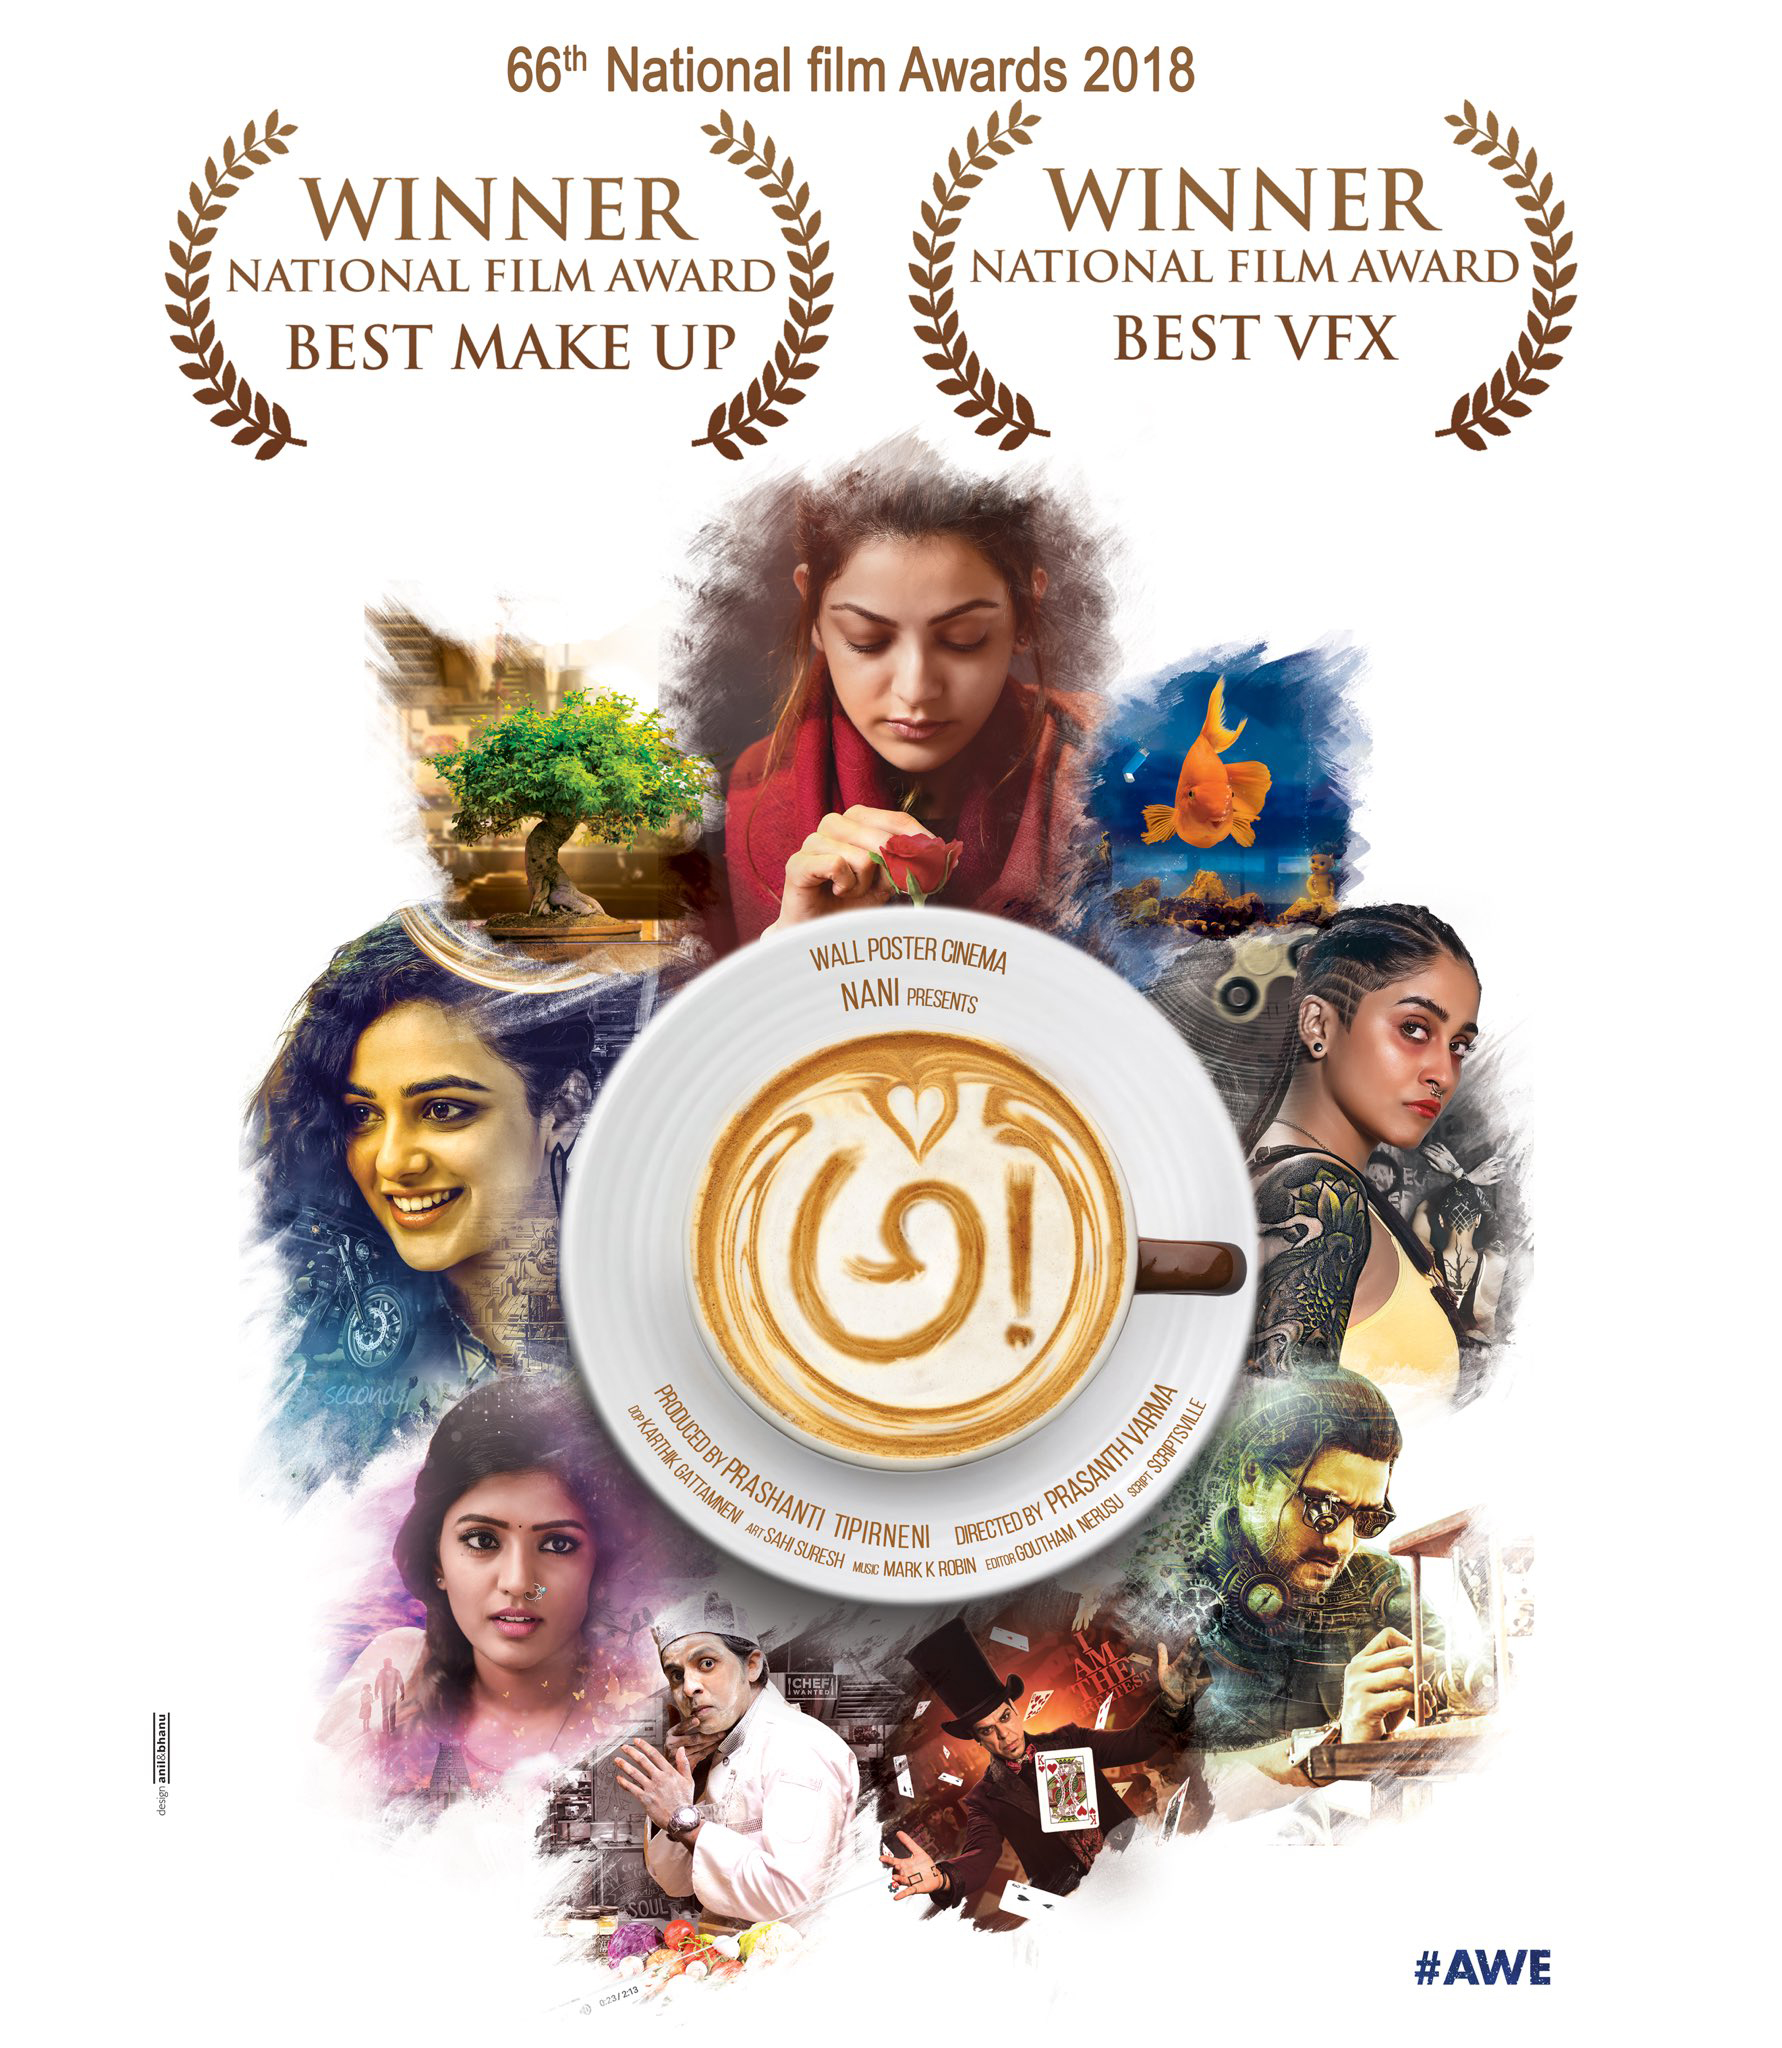 Telugu Awe, Devadarshini, Eesha Rebba, Kajal Aggarwal, Nithya Menen, Pragathi And Murali Sharma, Prasanth Varma\\'s, Prasanth Varma\\'s Latest Tweet About \\'awe-2\\' Raises Curiosity, Priyadarshi, Regina Cassandra, Srinivas Avasarala, Young Filmmaker Prasanth Varma-Breaking/Featured News Slide-Telugu Tollywood News Photos Pics